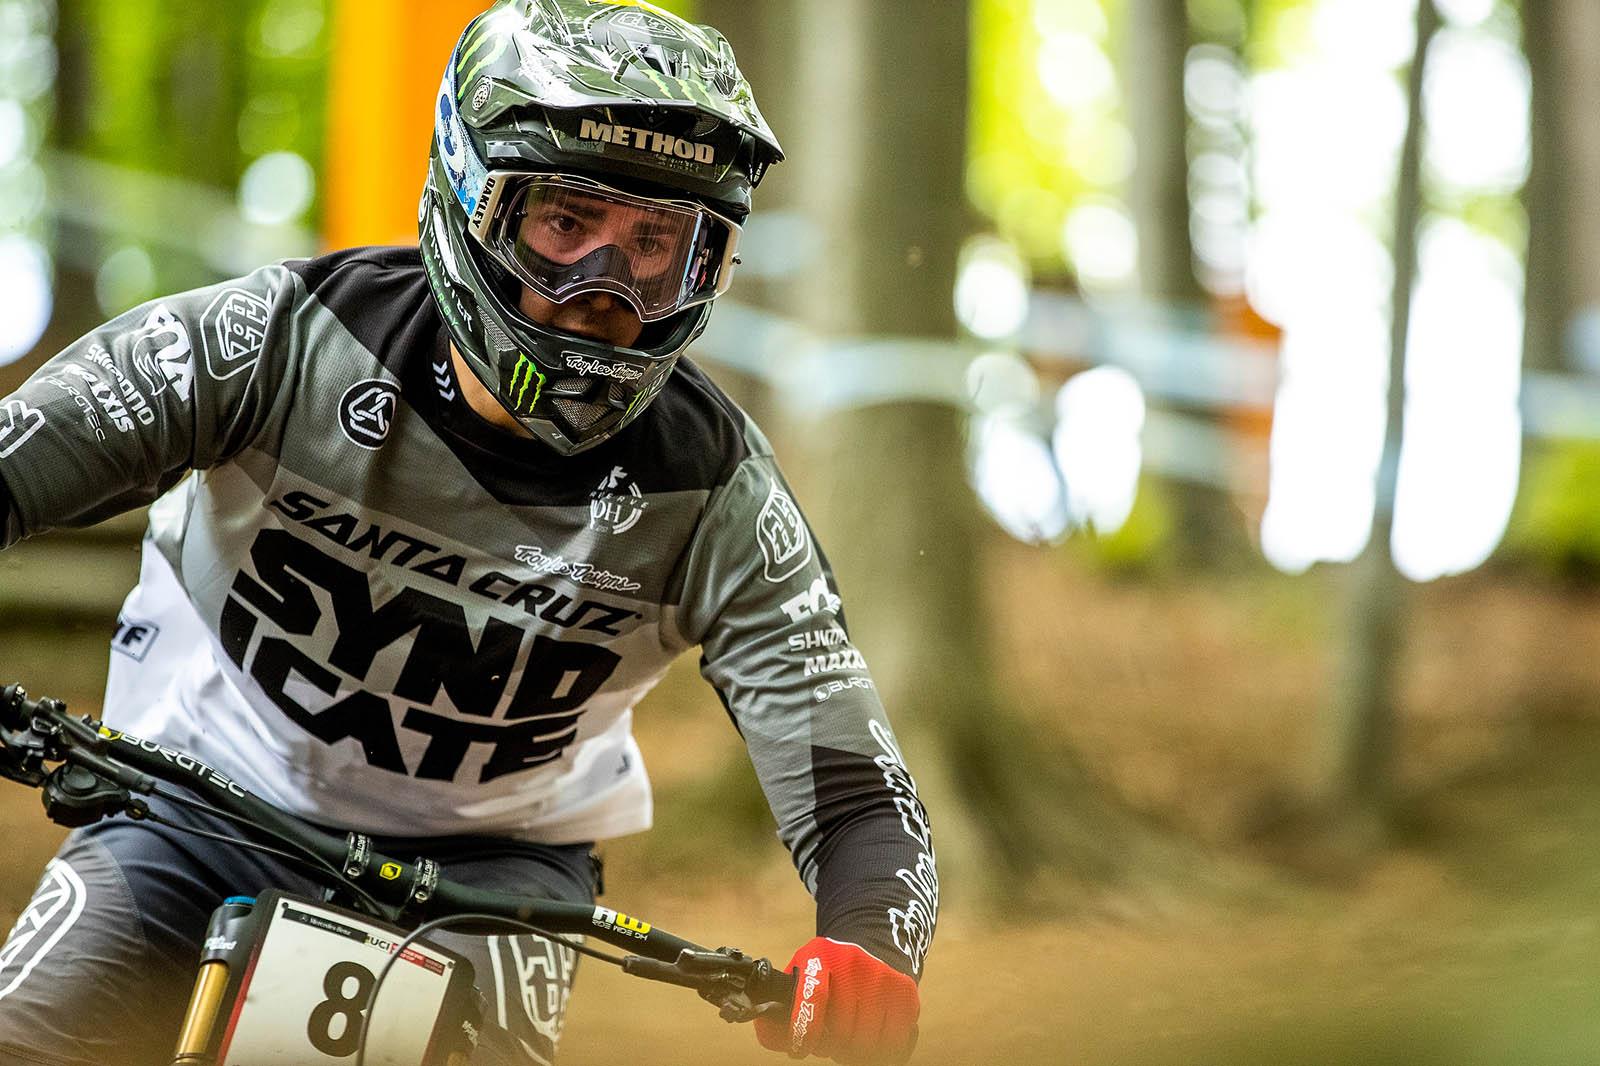 Santa Cruz Bicycles - UCI DH Maribor 2019 - Luca Shaw